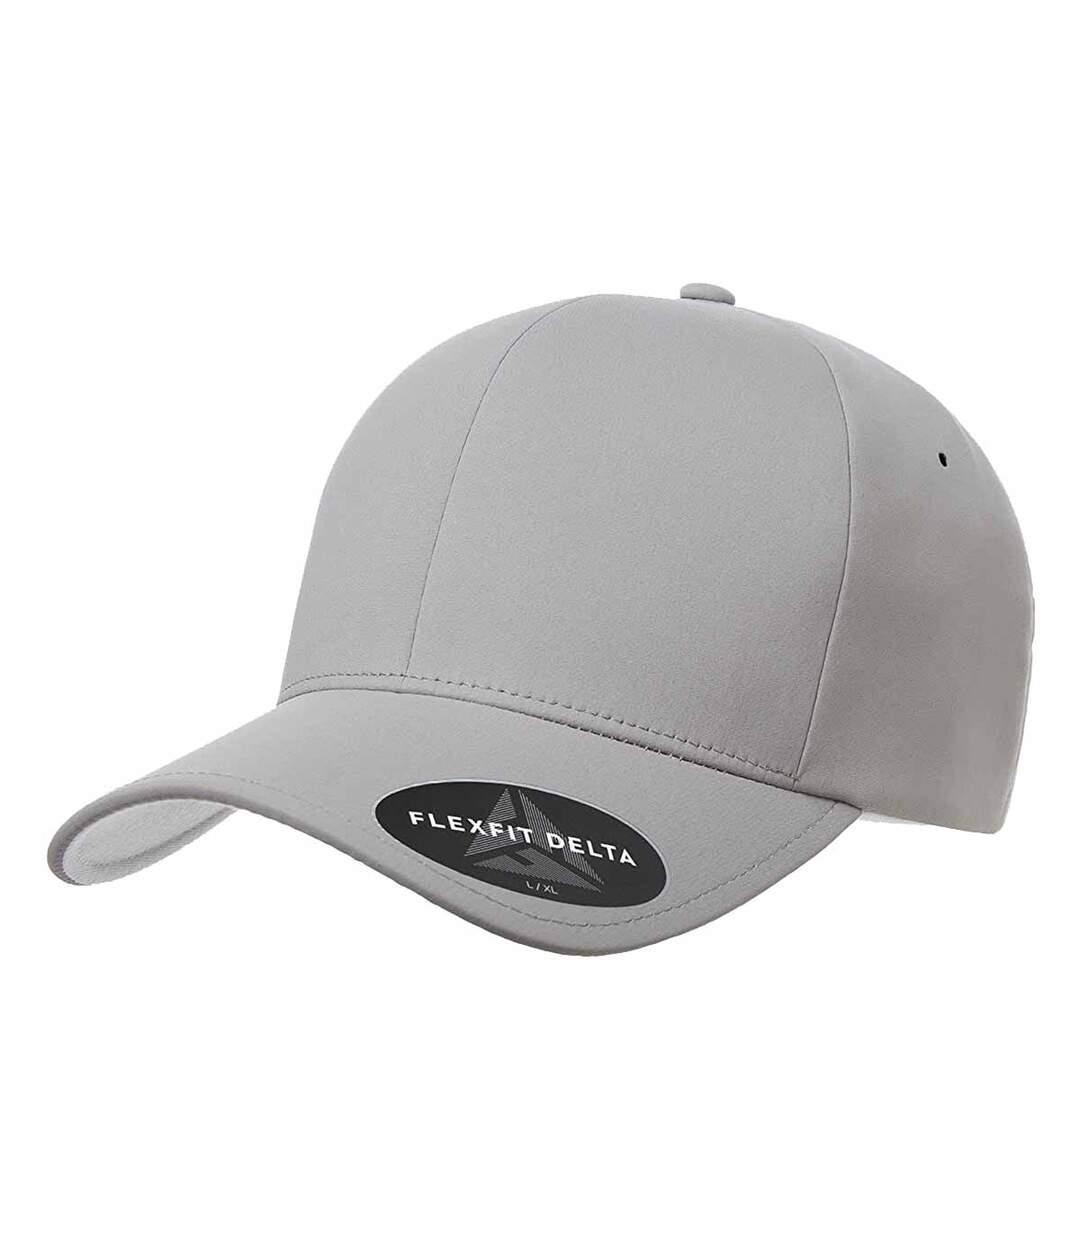 Nimbus Mens Ellington Bay Windproof Waterproof Jacket (White) - UTRW924